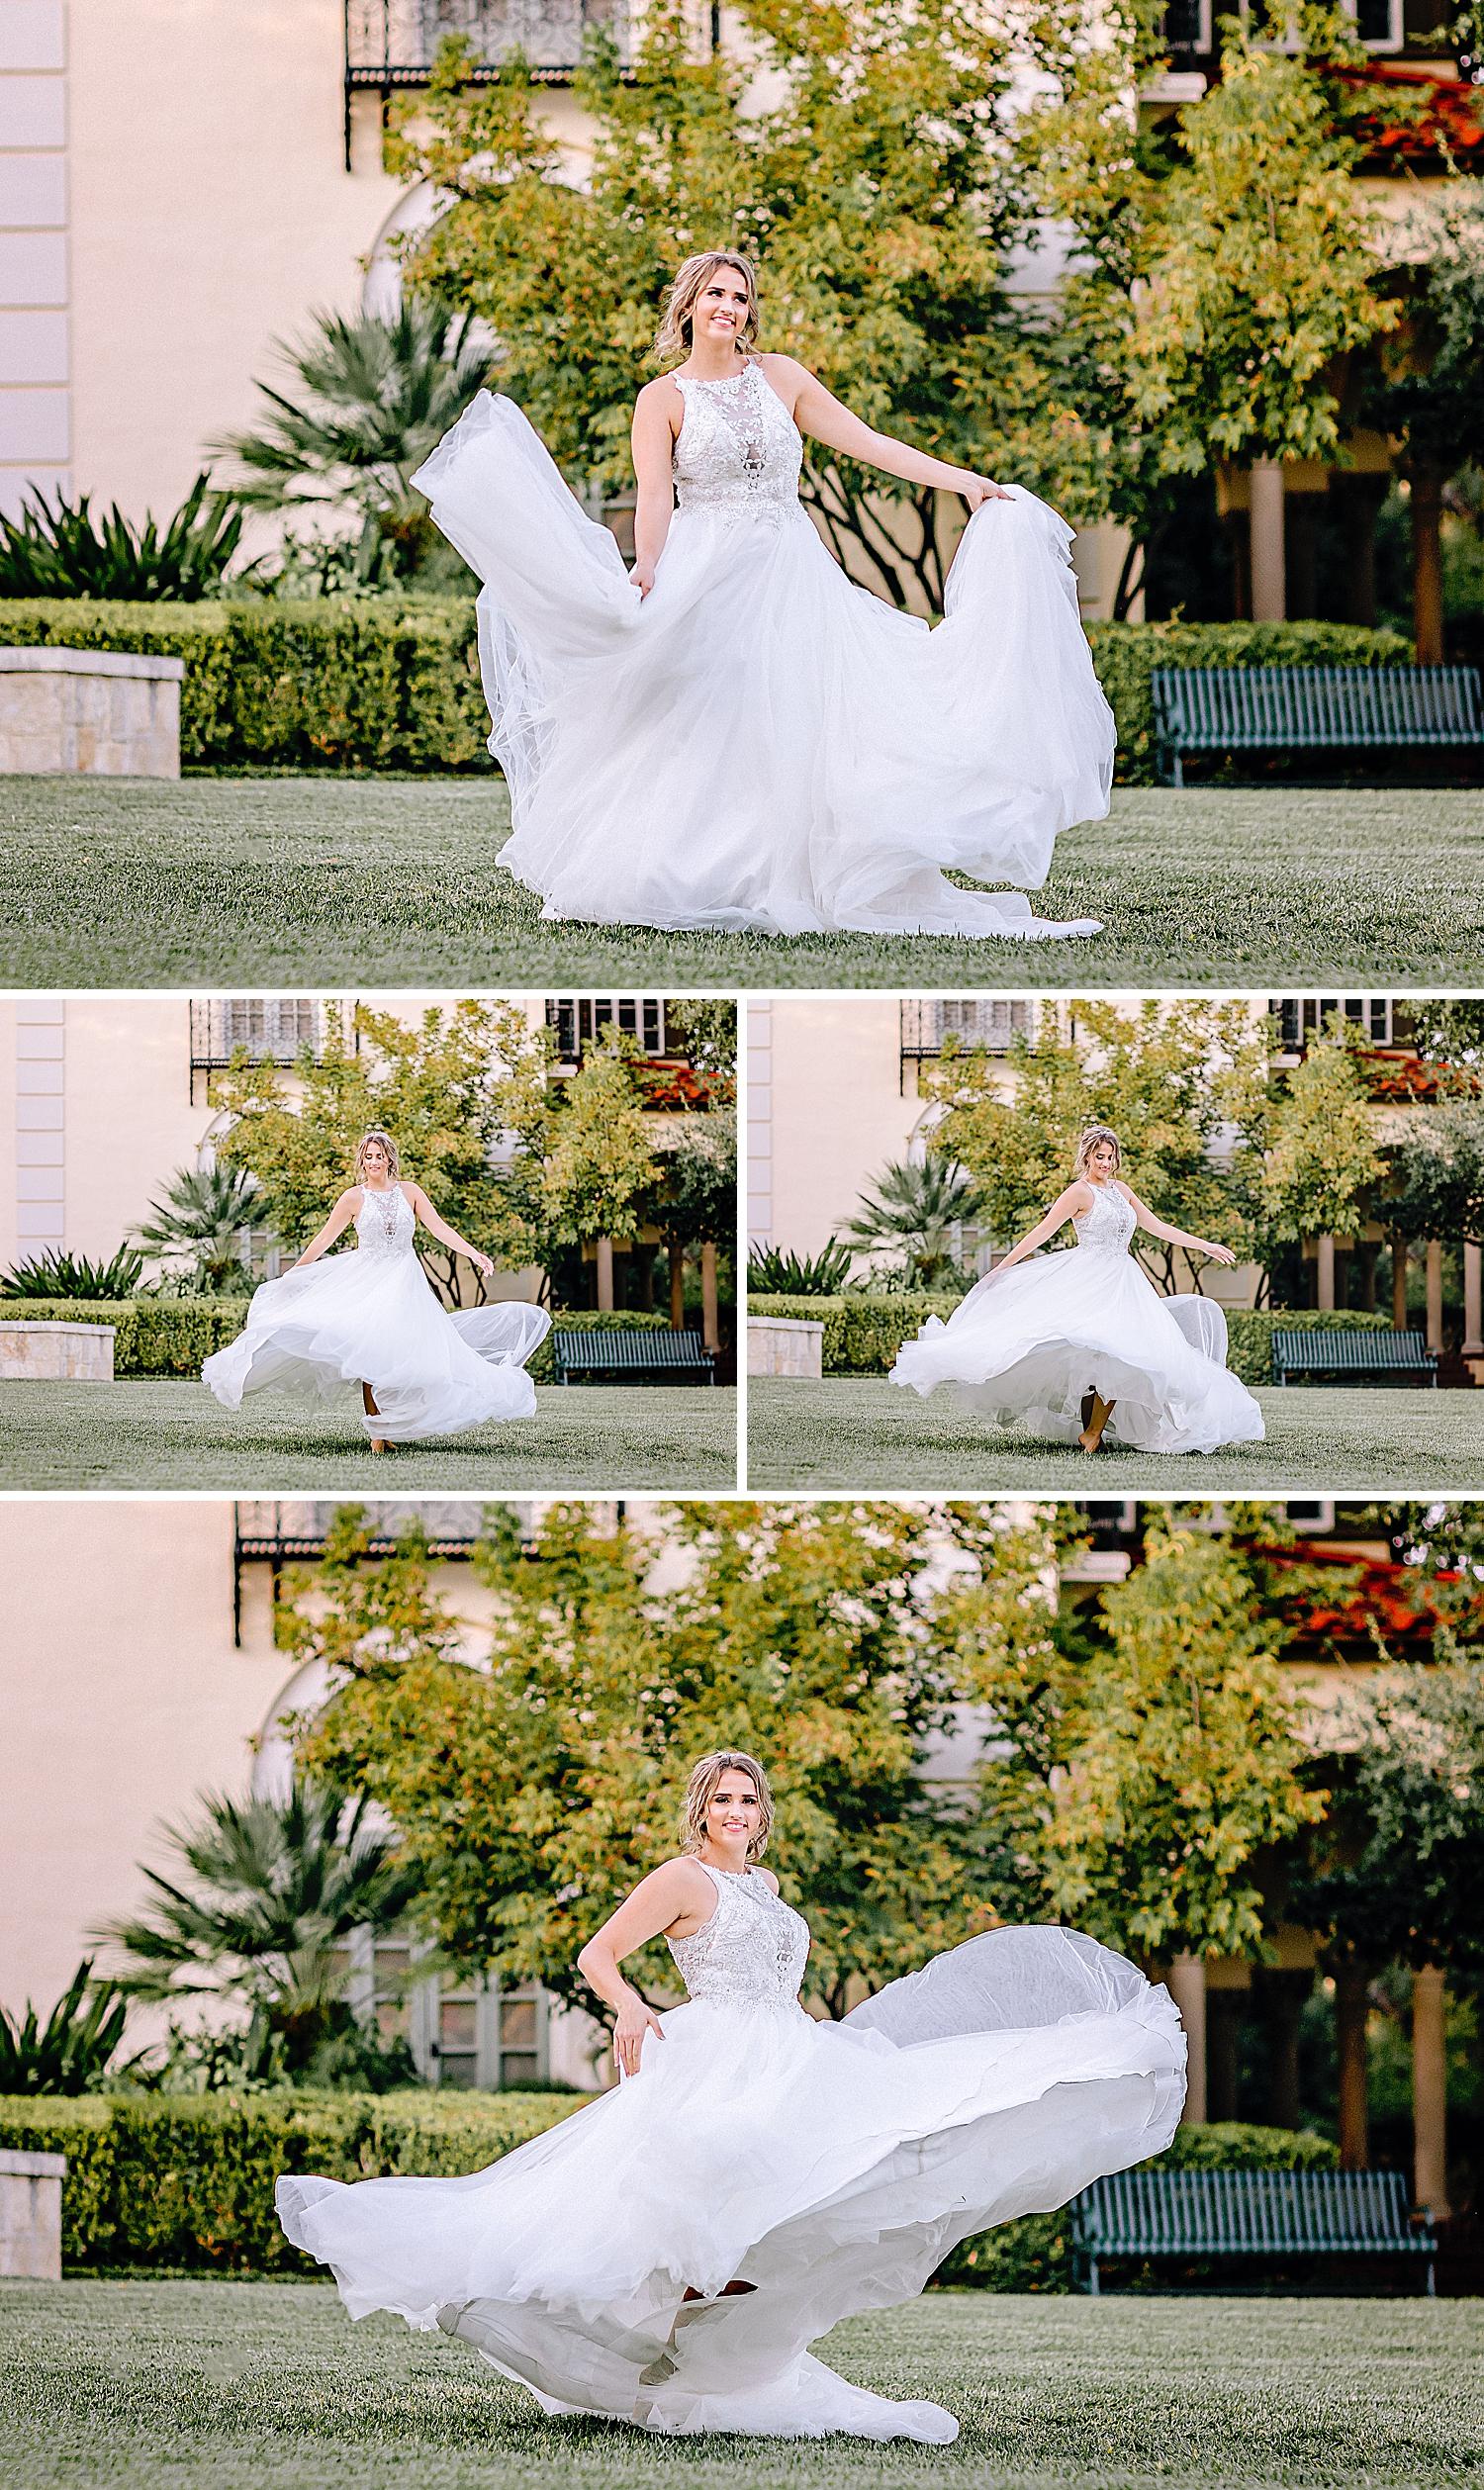 San-Antonio-Weddings-Bridal-Photos-Carly-Barton-Photography_0016.jpg